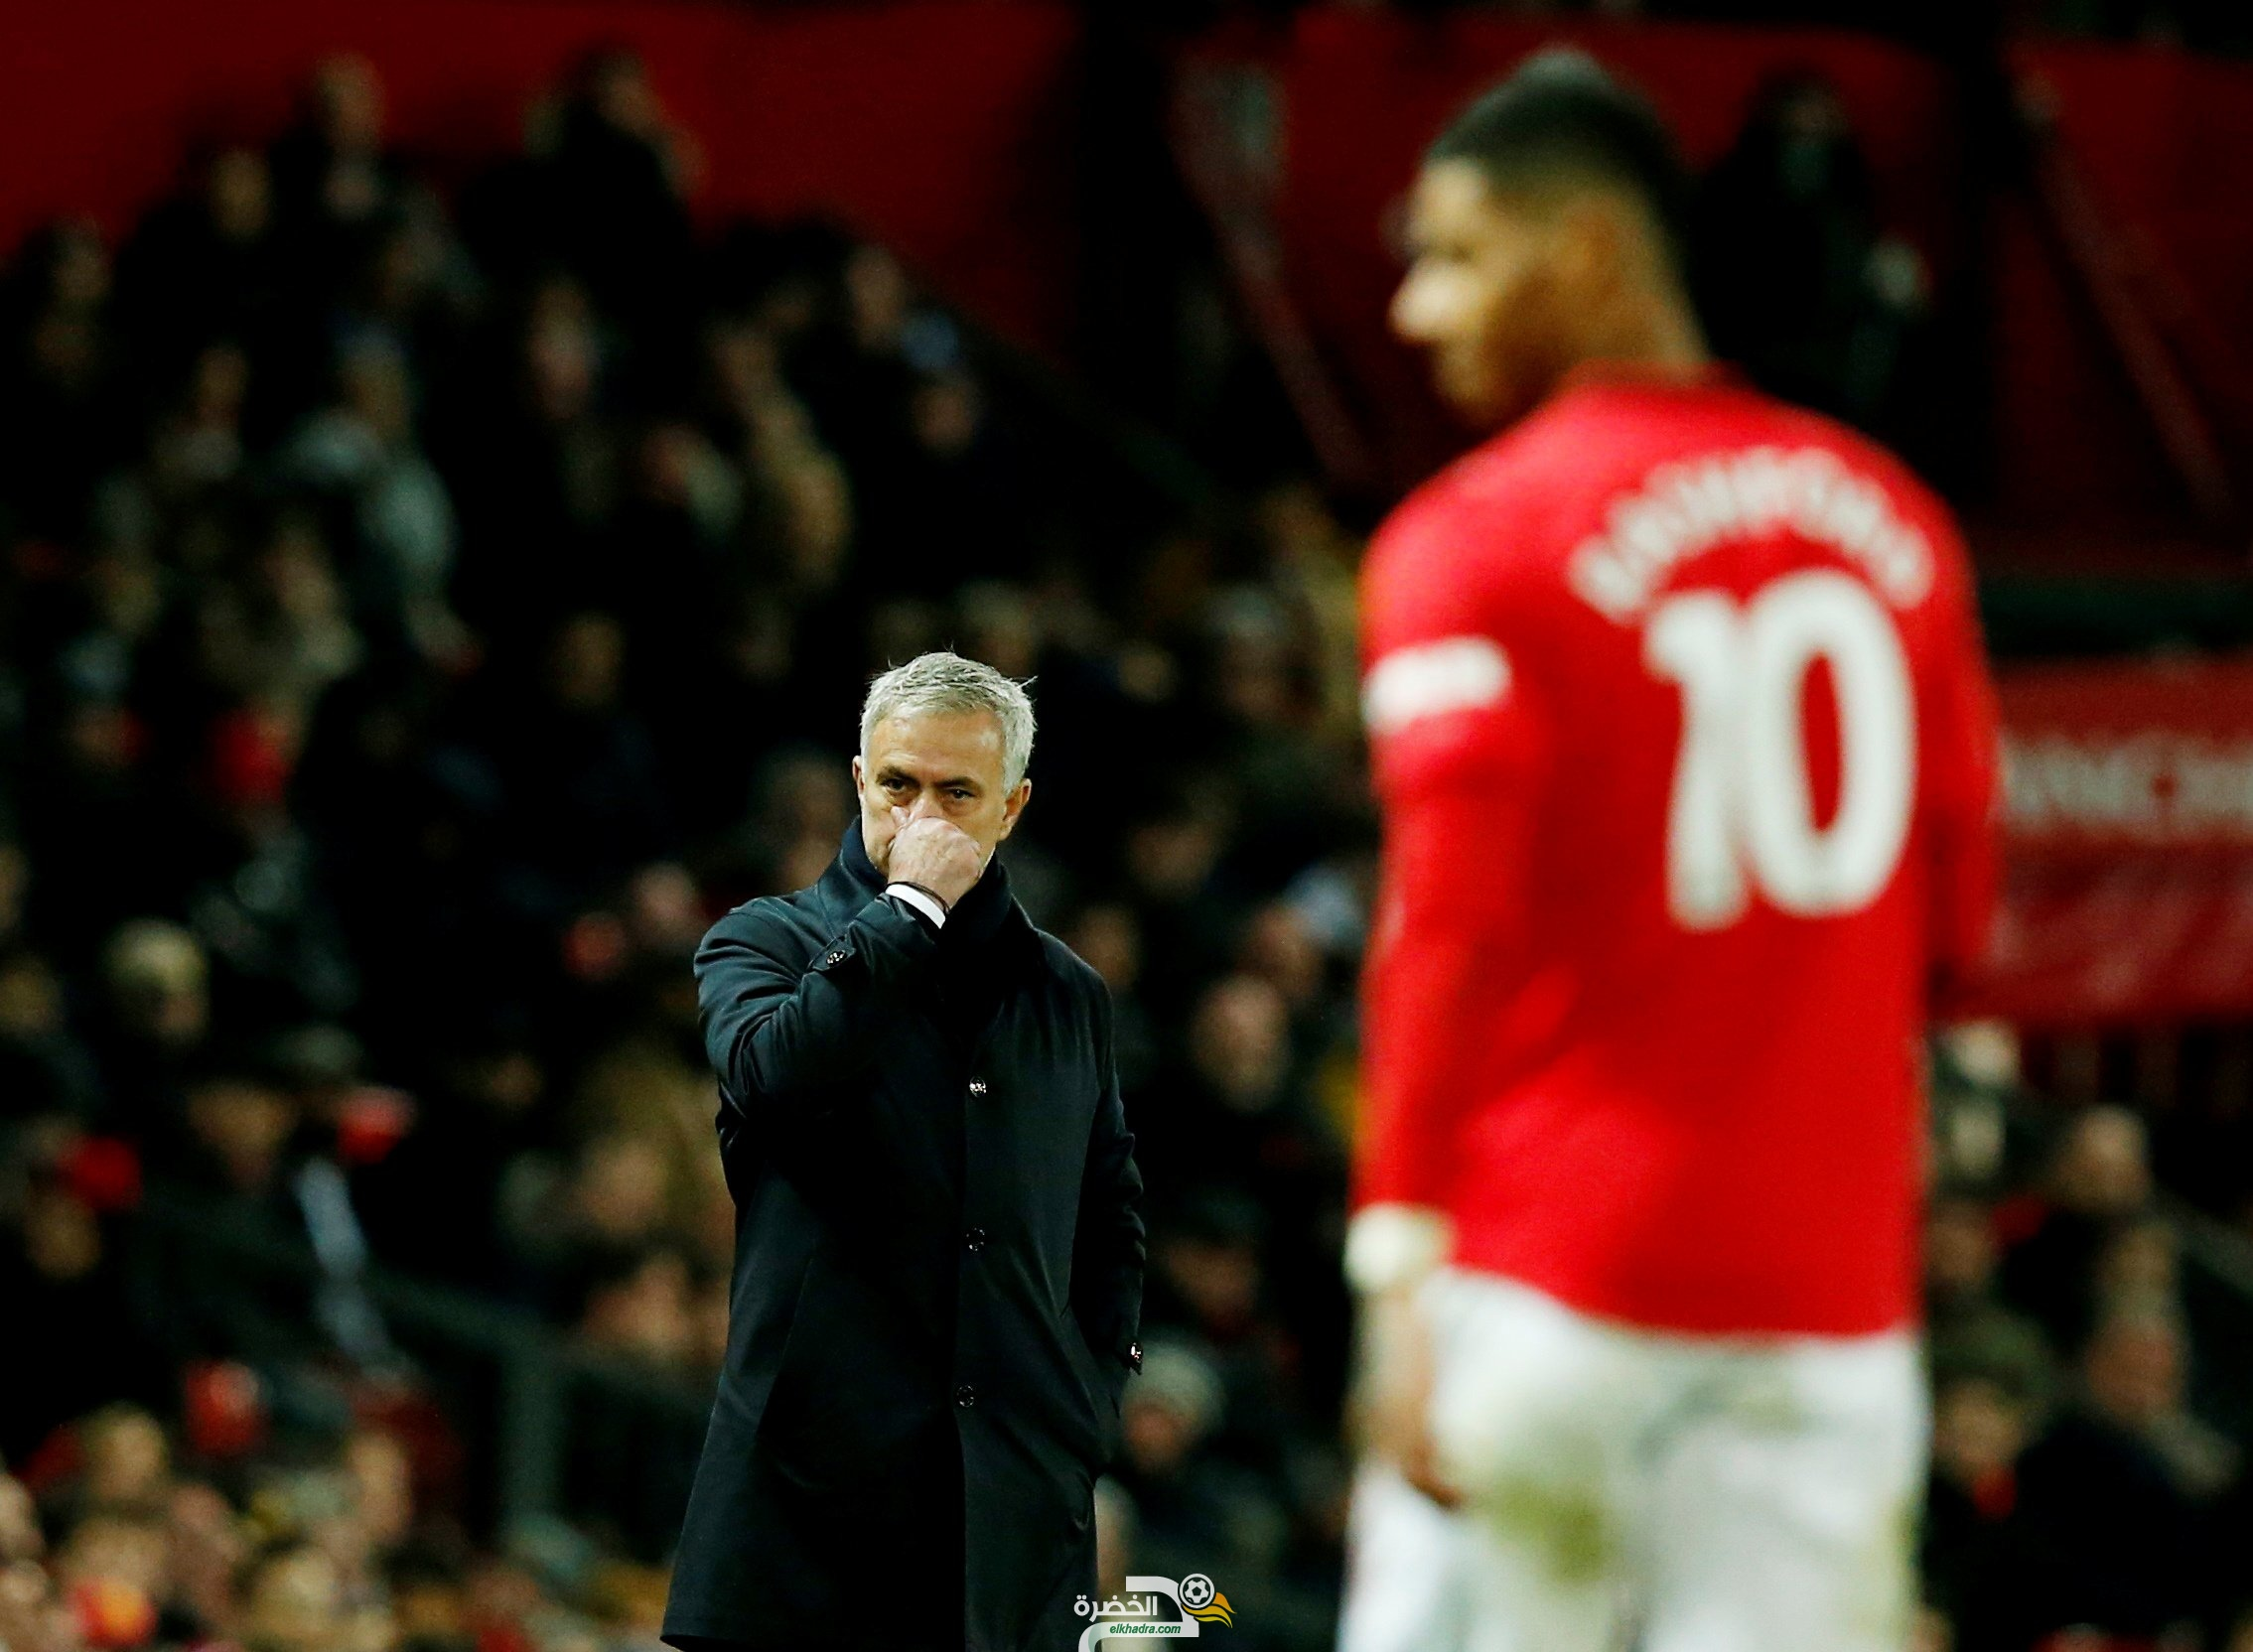 مورينيو يتكبد أول خسارة له مع توتنهام ضد مانشستر يونايتد 30